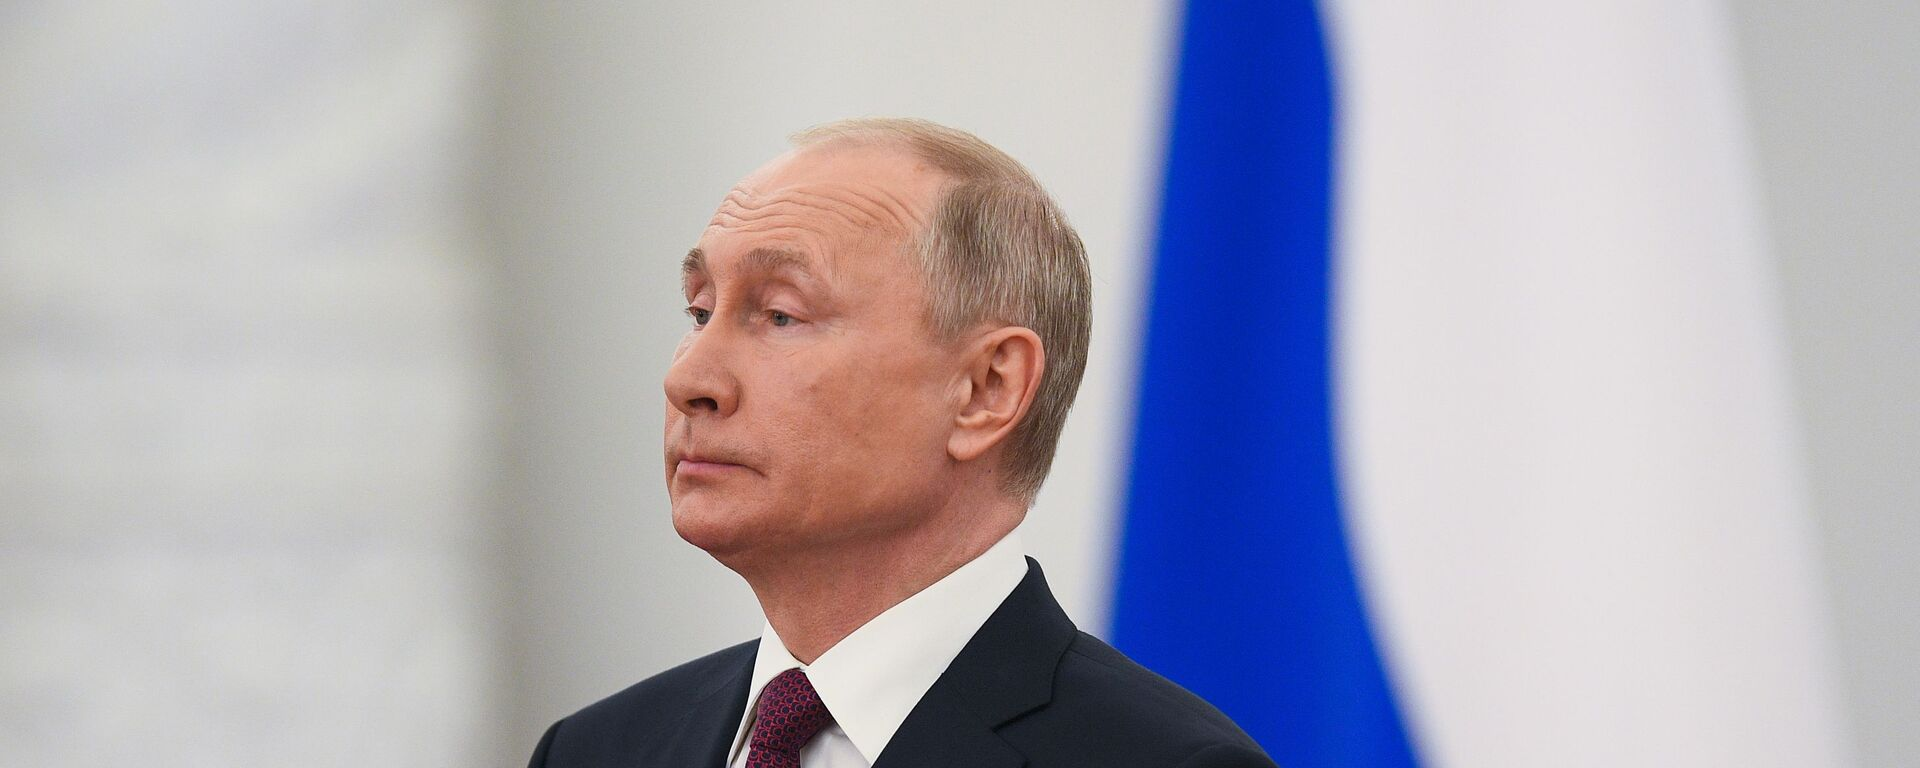 Tổng thống Nga Vladimir Putin. - Sputnik Việt Nam, 1920, 14.06.2021